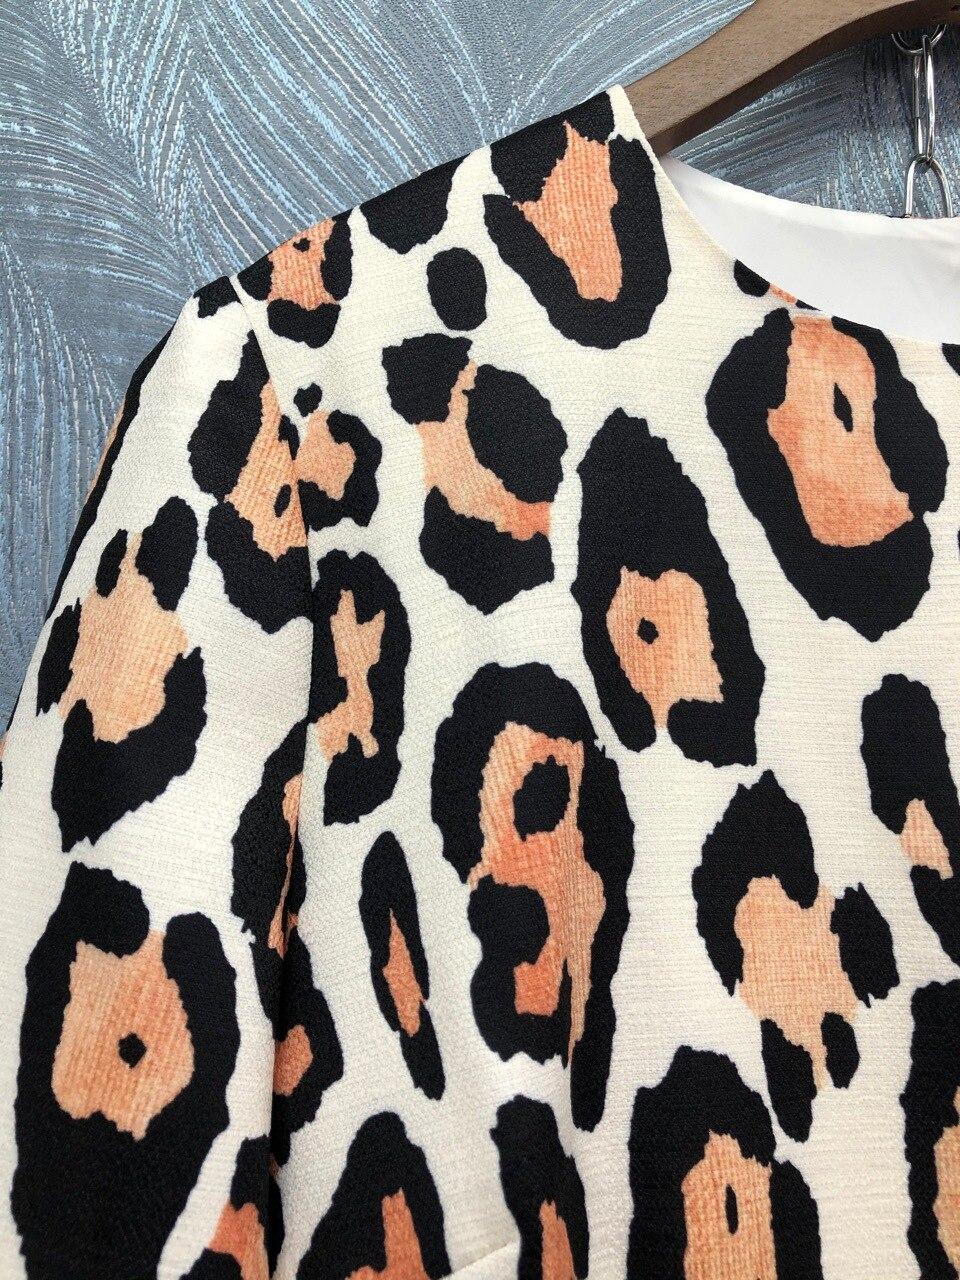 Europe&America women sexy leopard dress  spring summer runways half sleeve dress B236 3